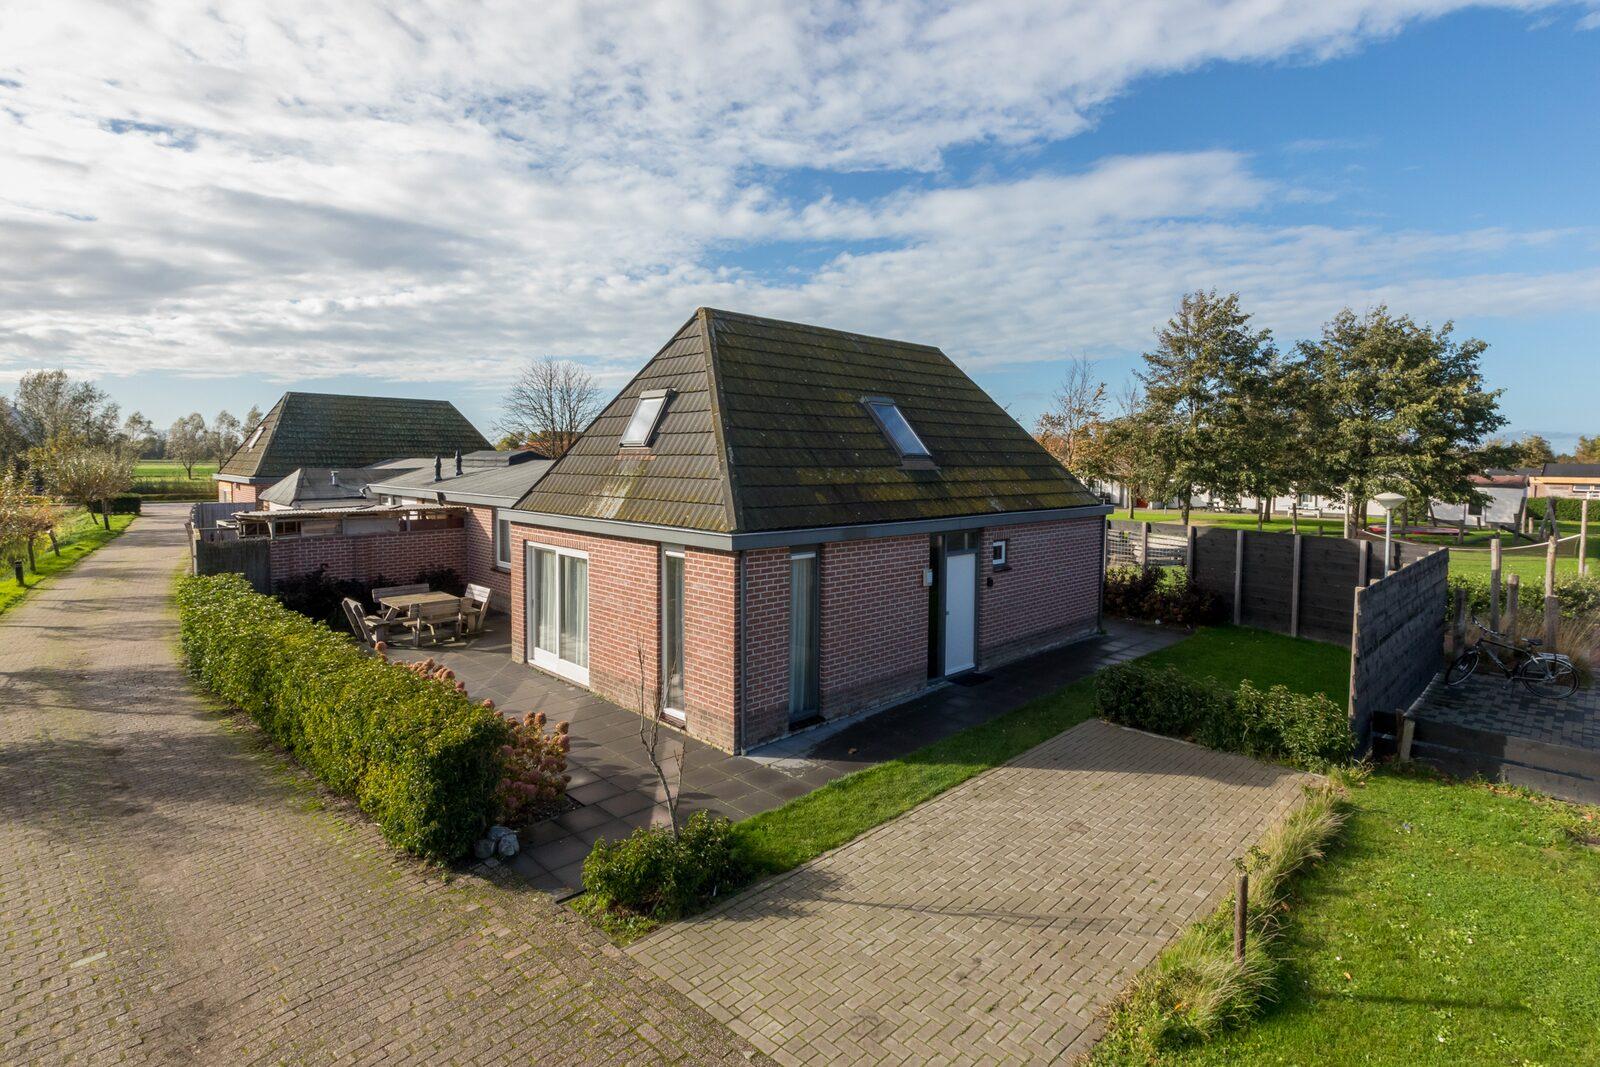 Familyhome - Oostkapelsweg 32 | Serooskerke 'Reigertje'